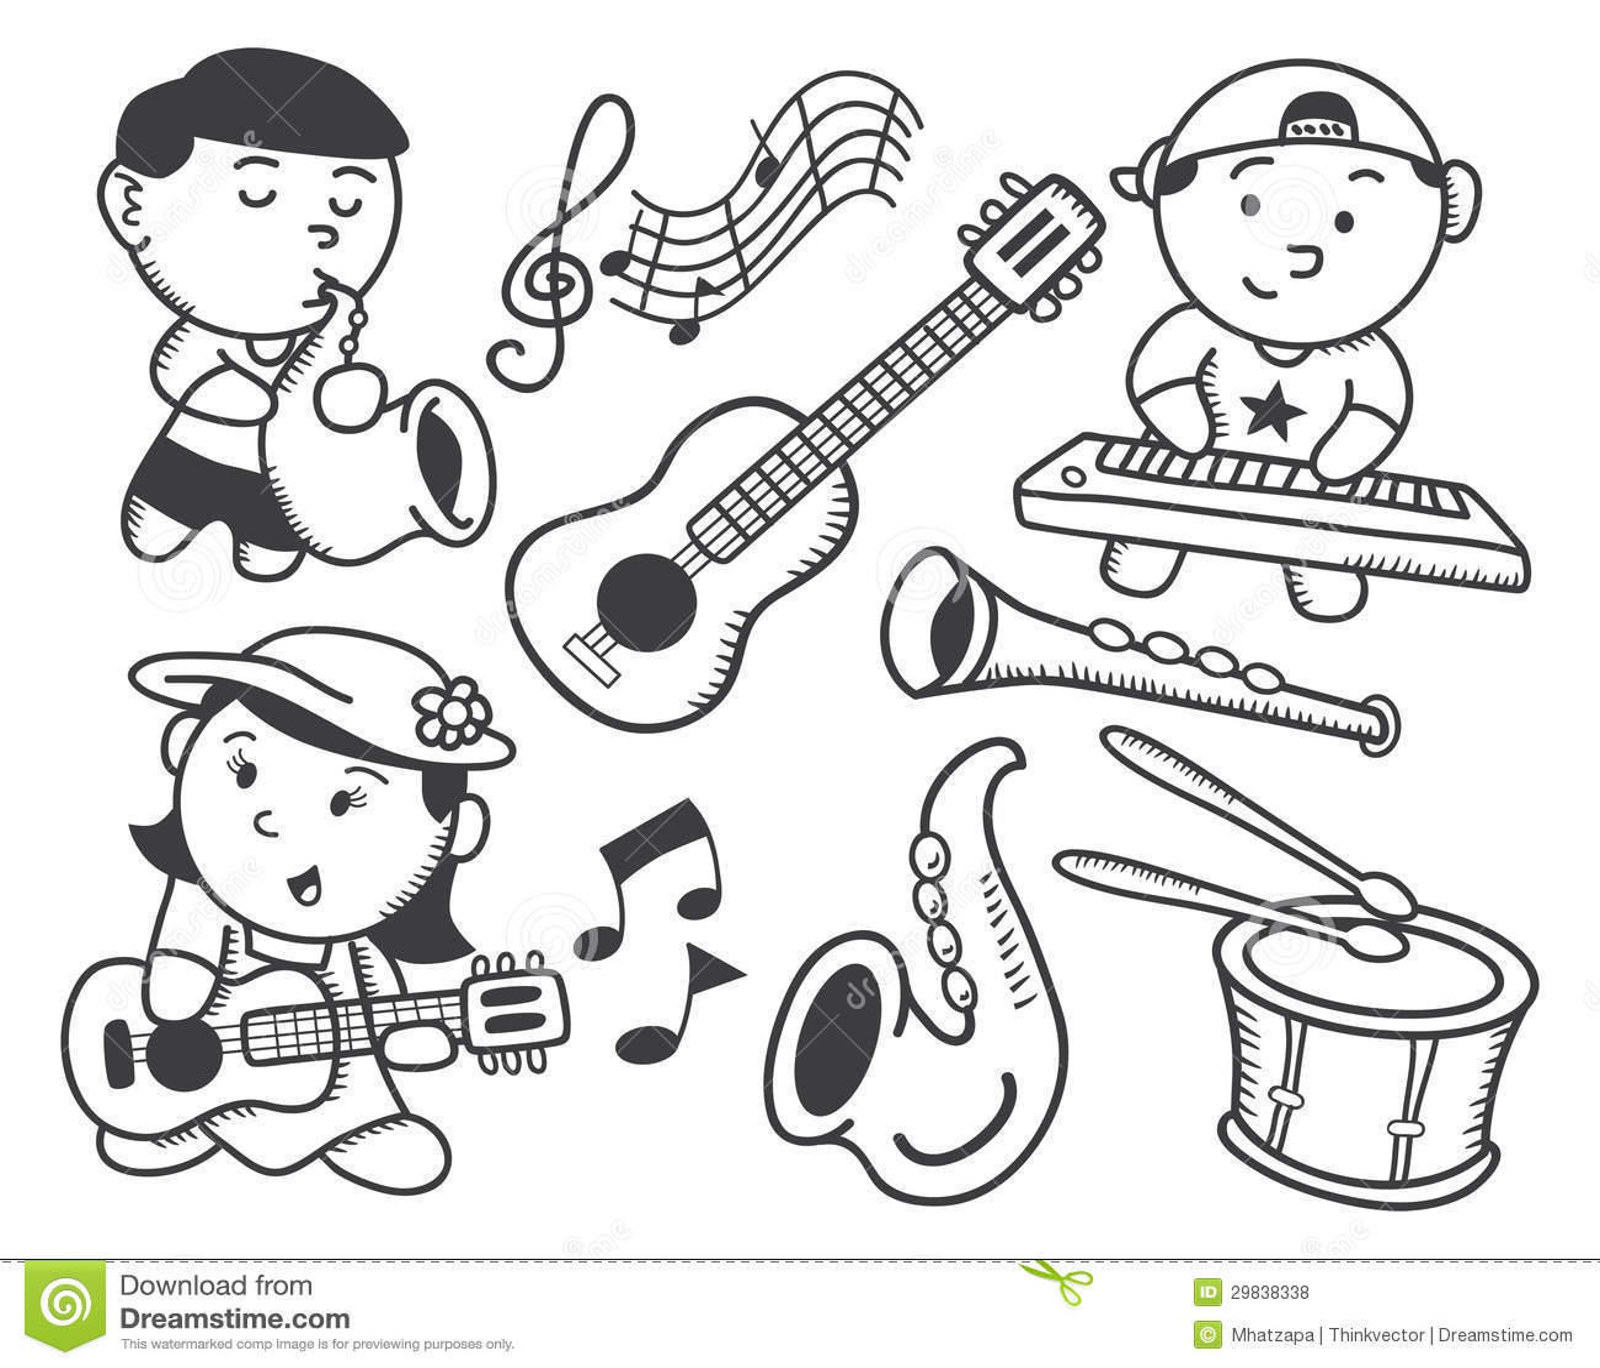 Children Playing Music Royalty Free Stock Photos